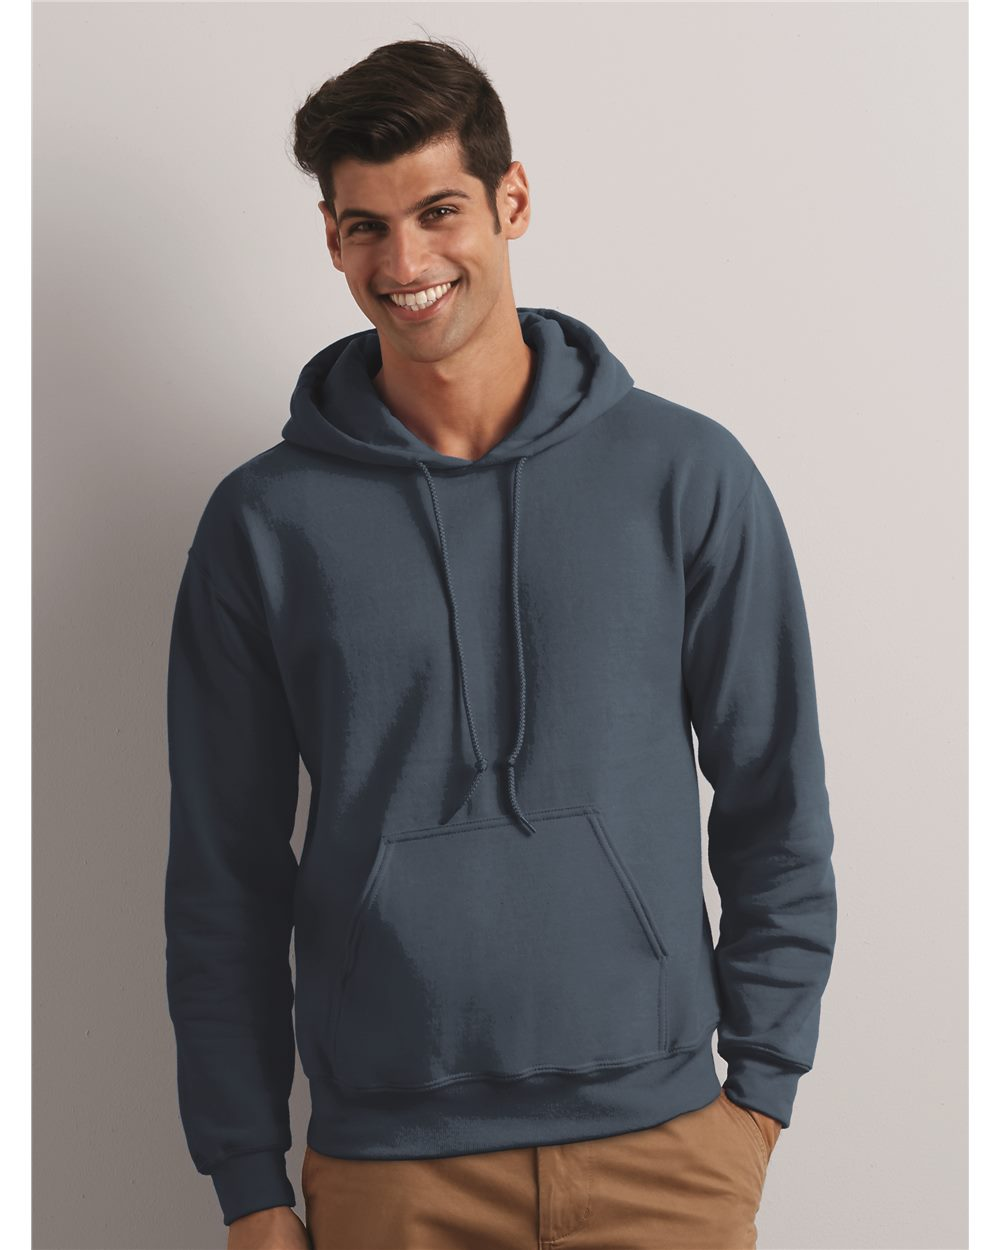 Carolina Blue Sweater